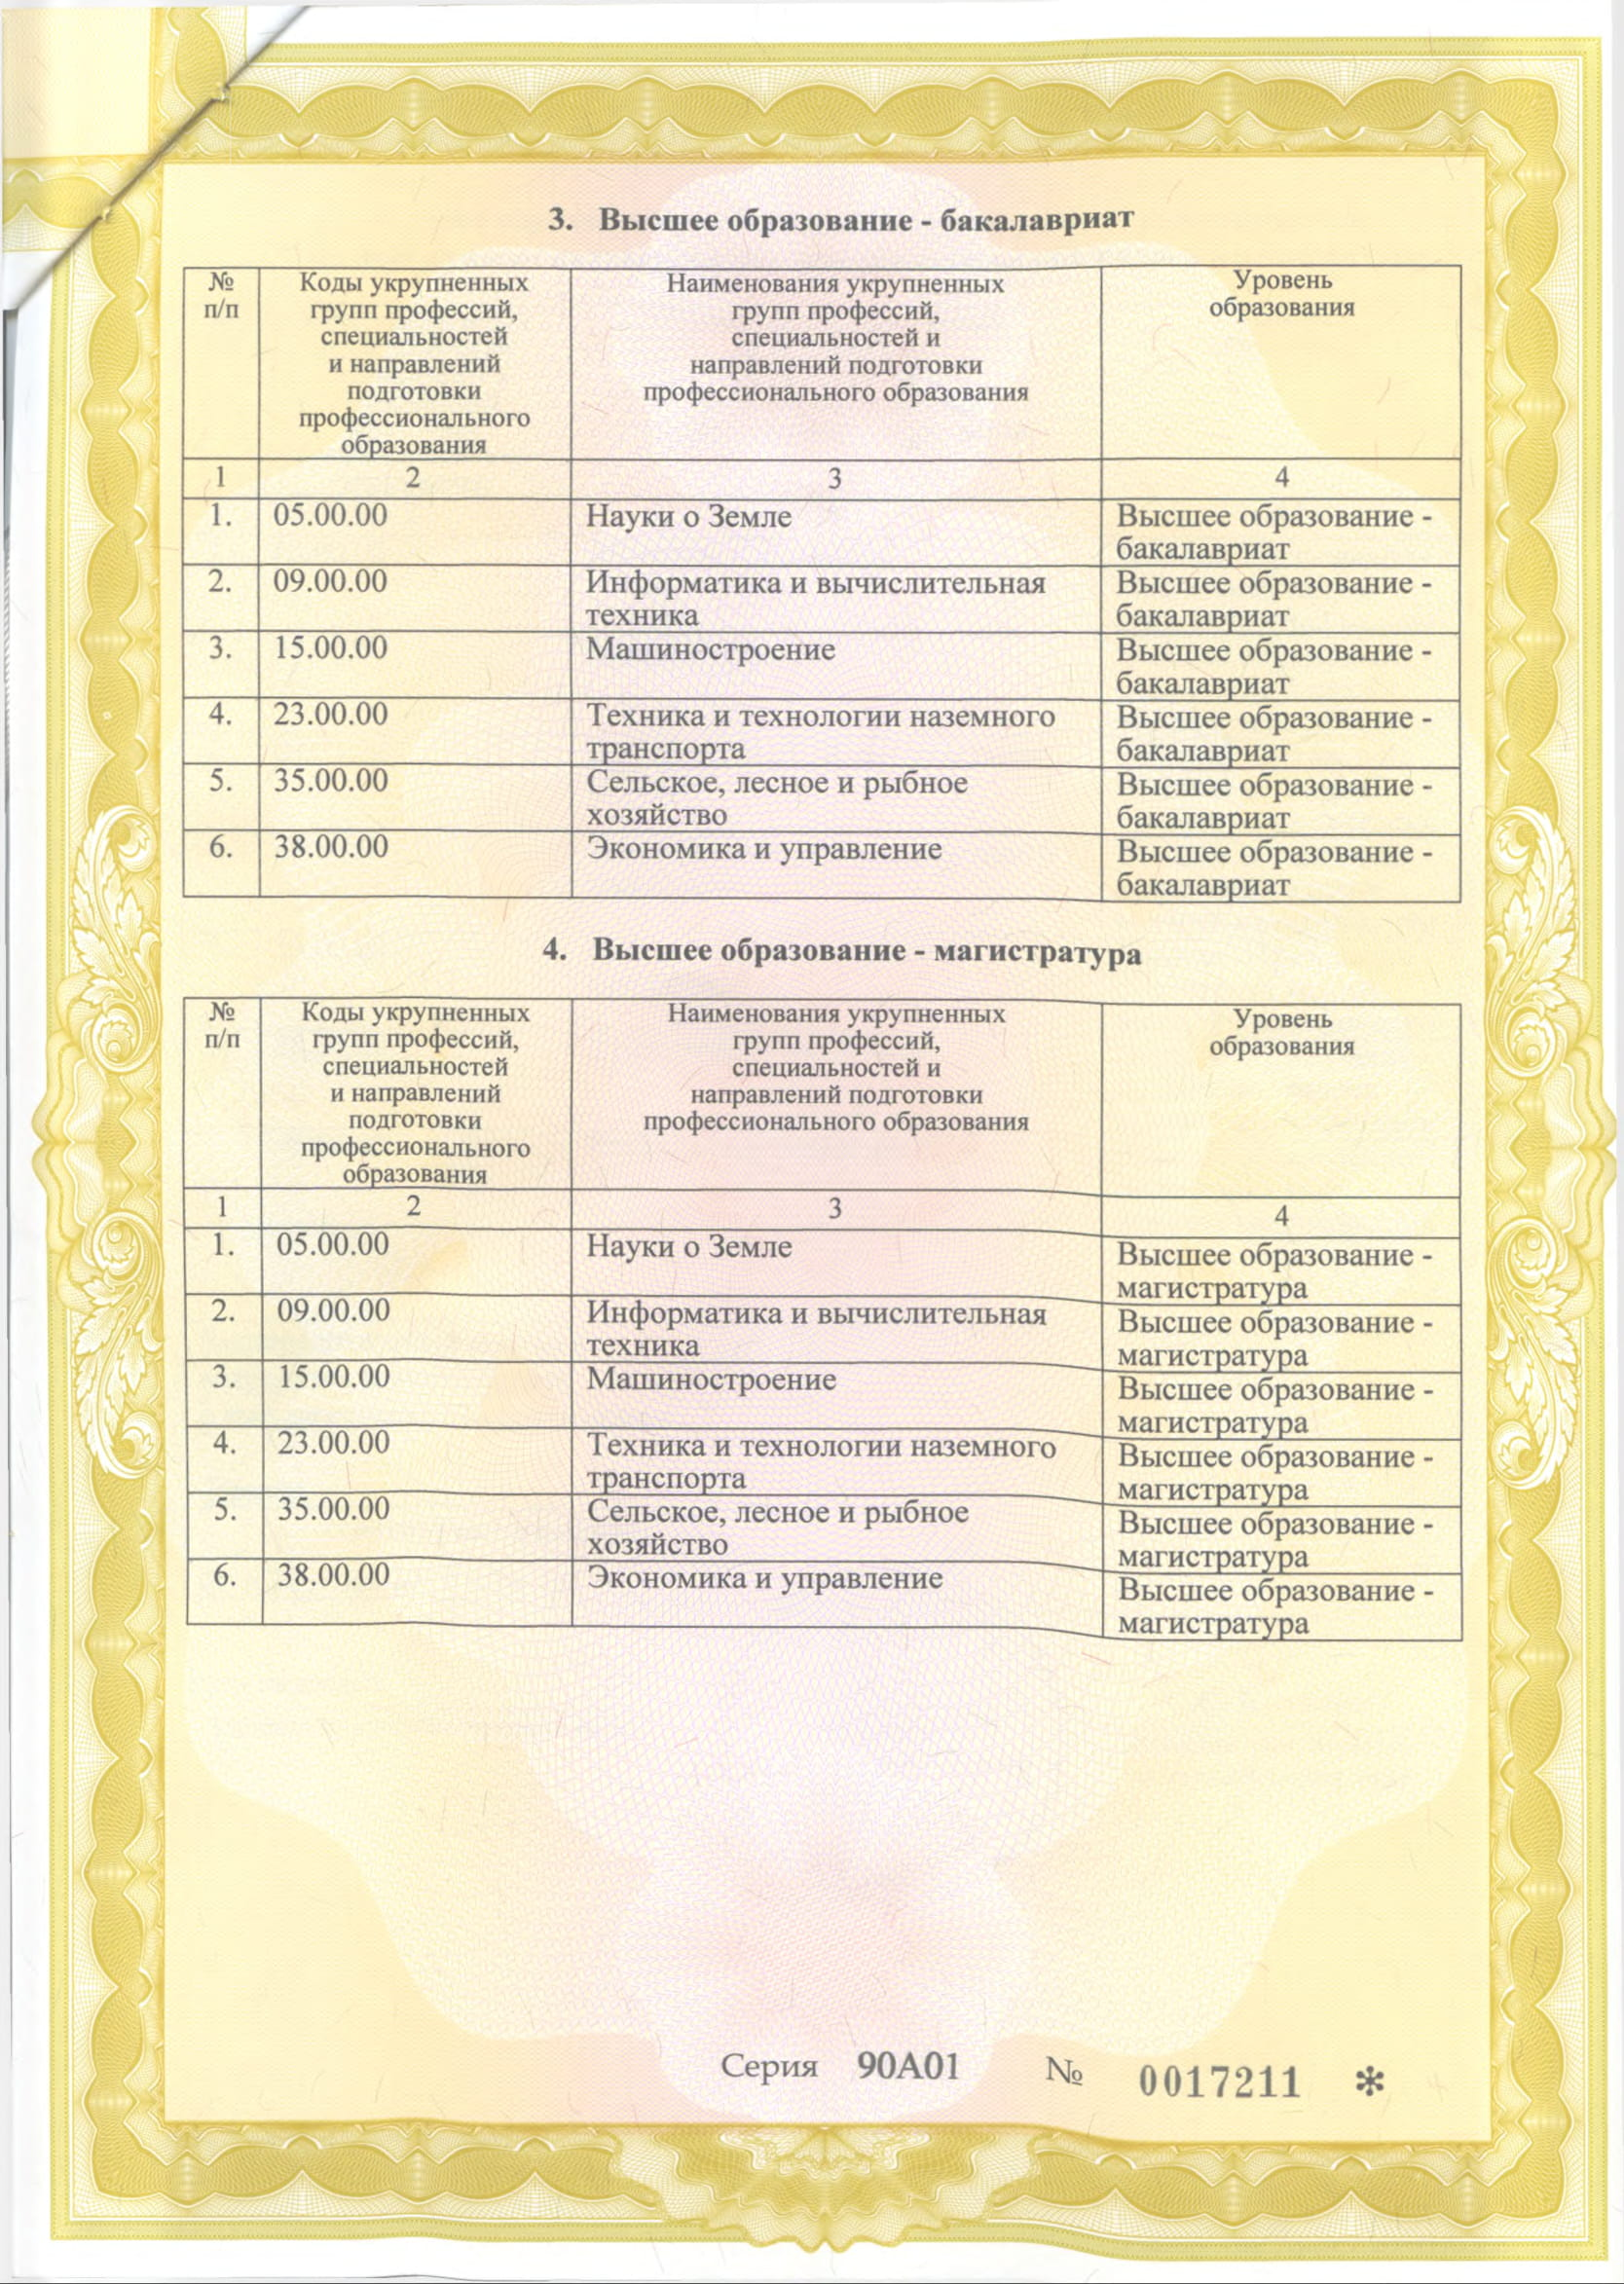 http://departamentvpo.ru/wp-content/uploads/2019/06/prilozhenie-k-akkreditacii_22.05.19-2.jpg